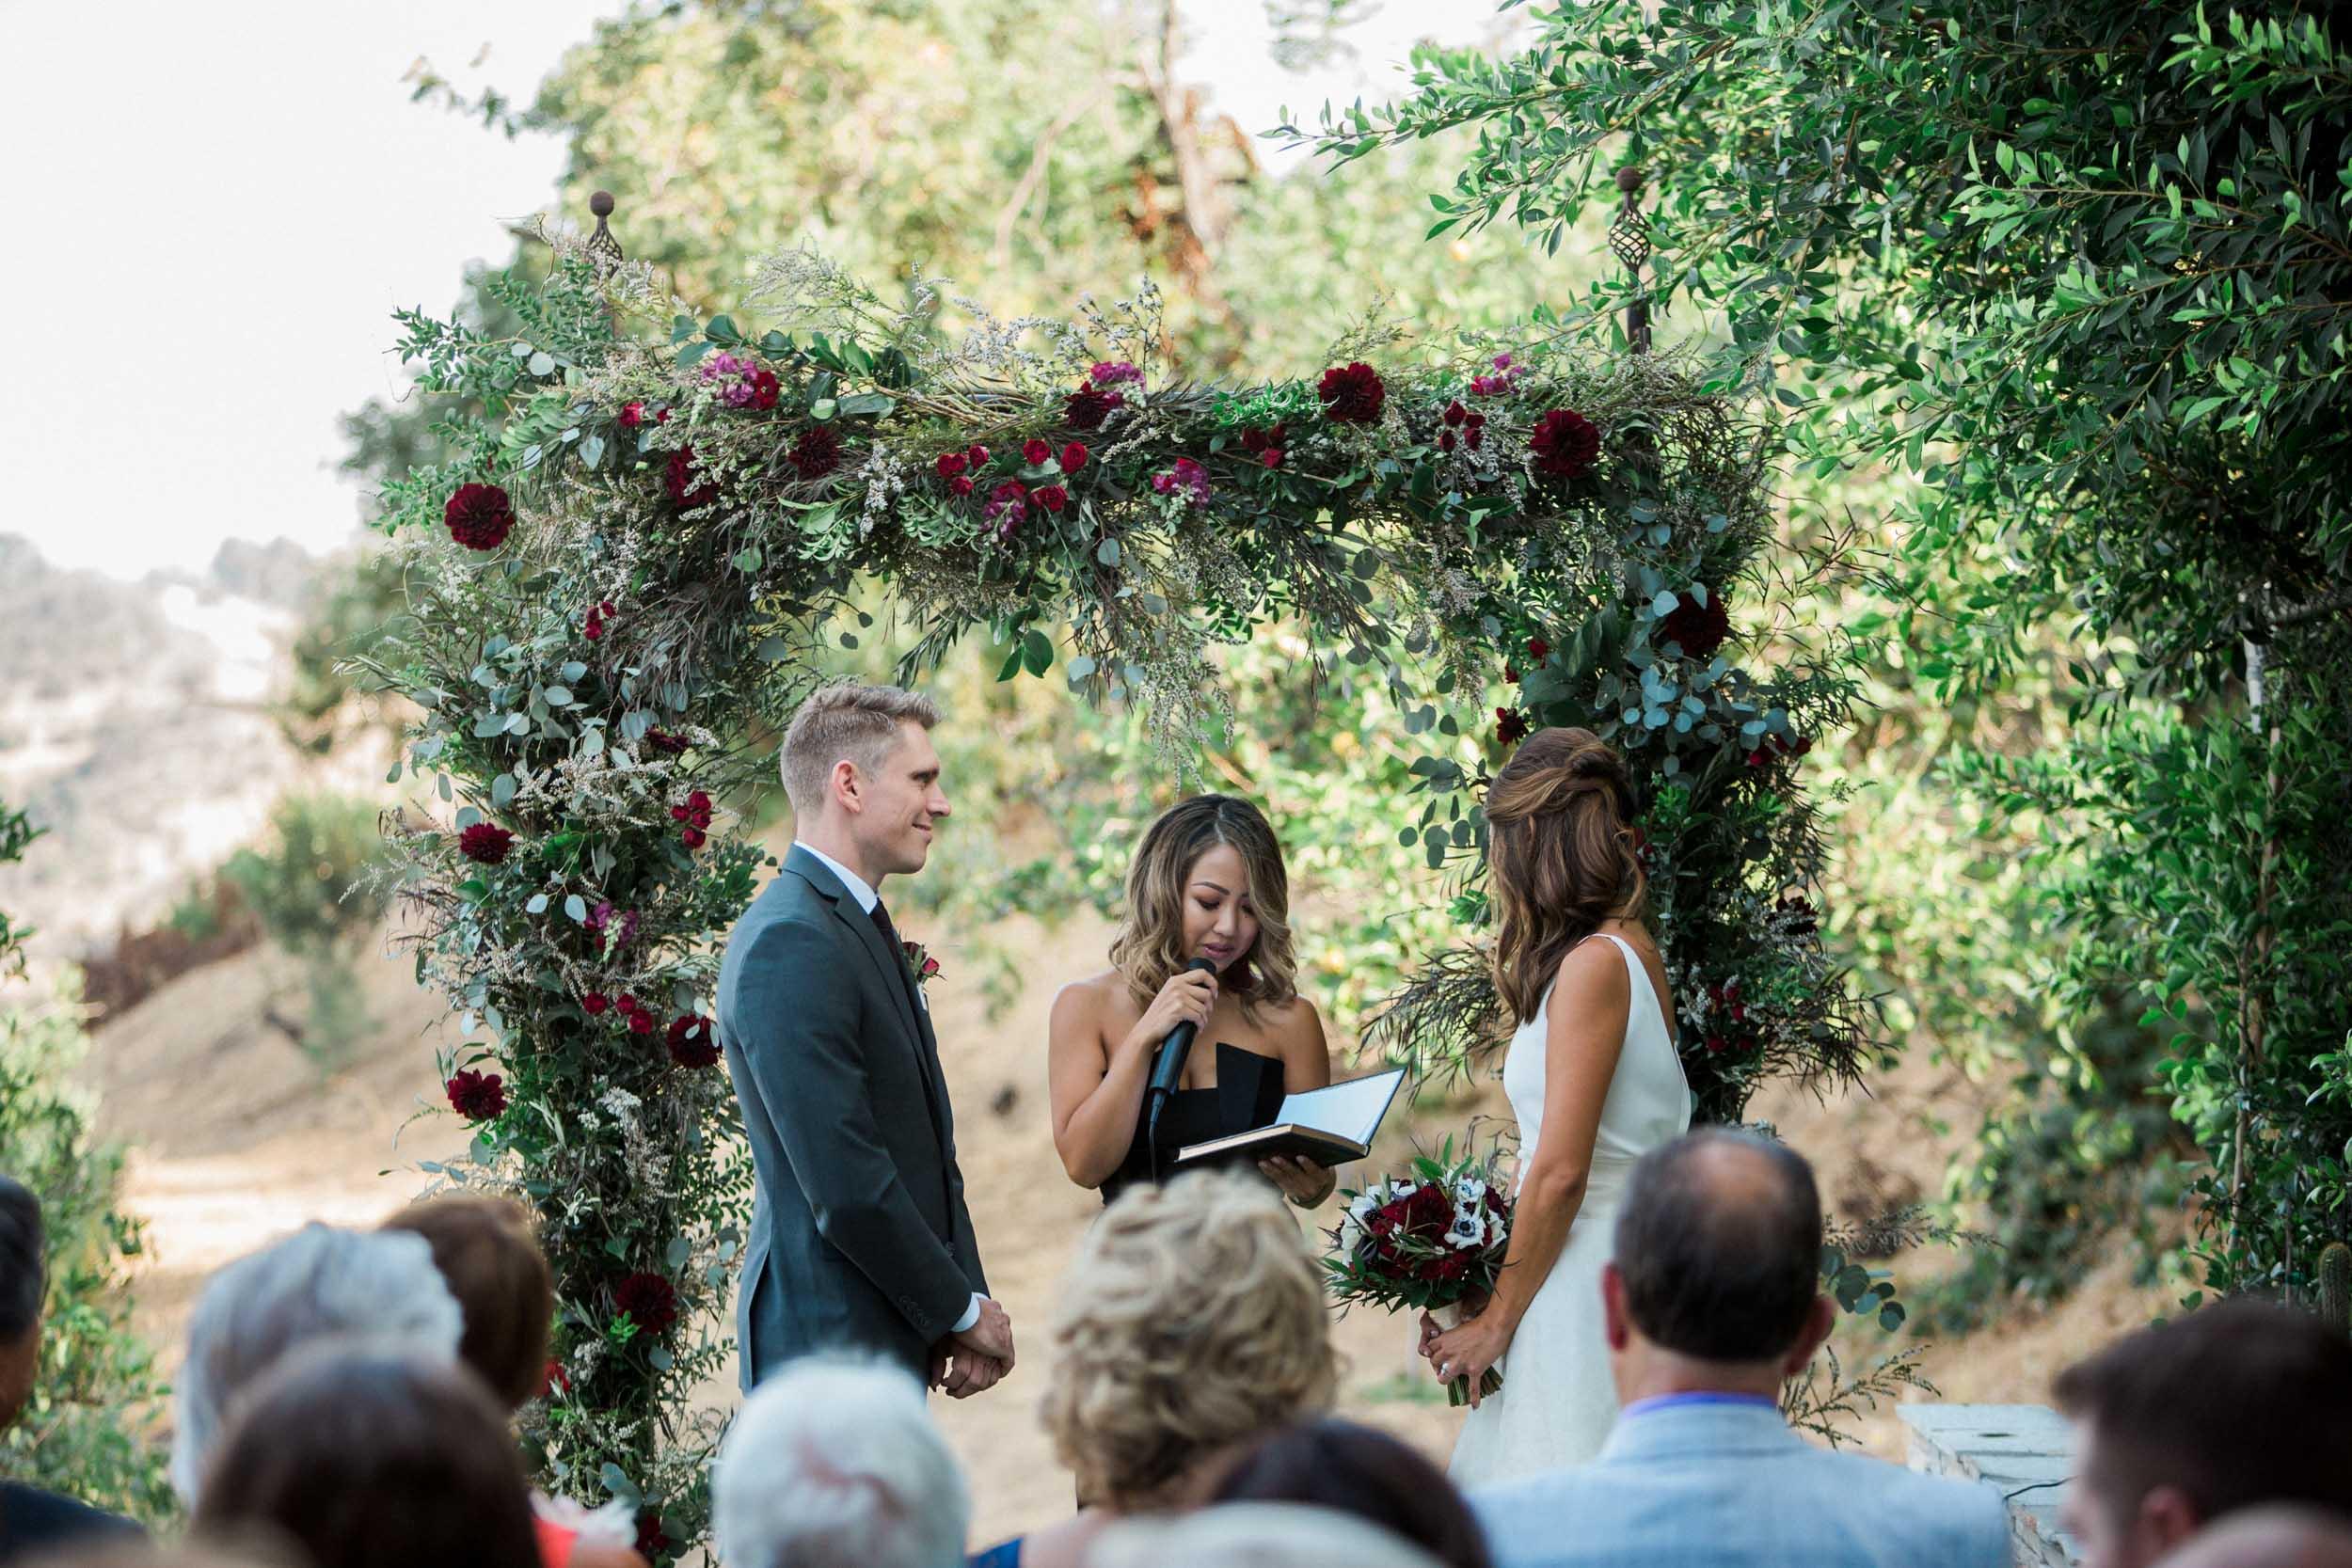 BKM-Photography-Highland-Park-Los-Angeles-Backyard-Wedding-0032.jpg